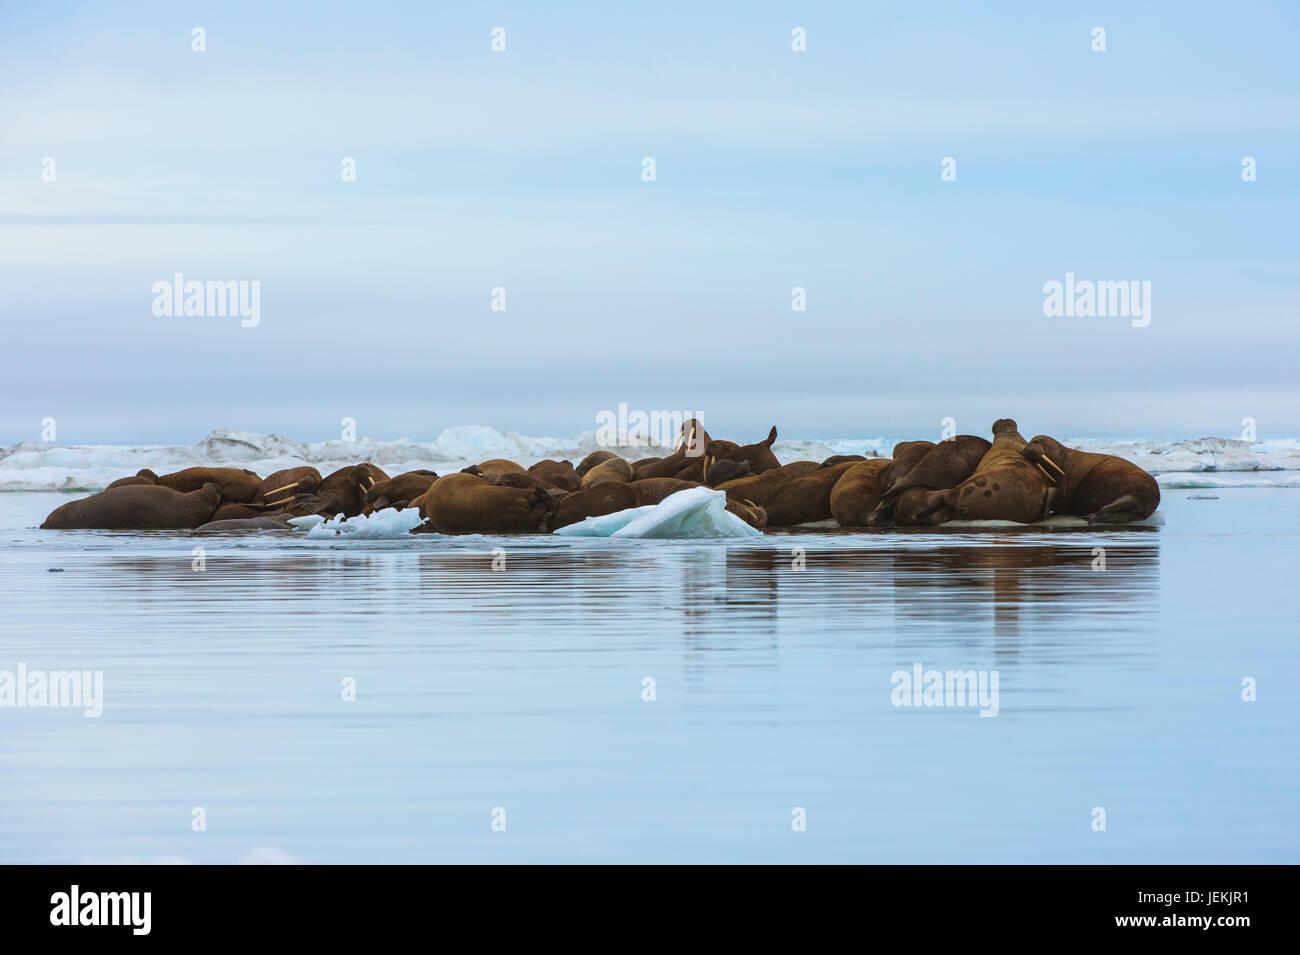 Grupo de morsas (Odobenus rosmarus) descansa sobre un flujo de hielo, Krasin Bay, isla de Wrangel, Mar Chuckchi, Imagen De Stock